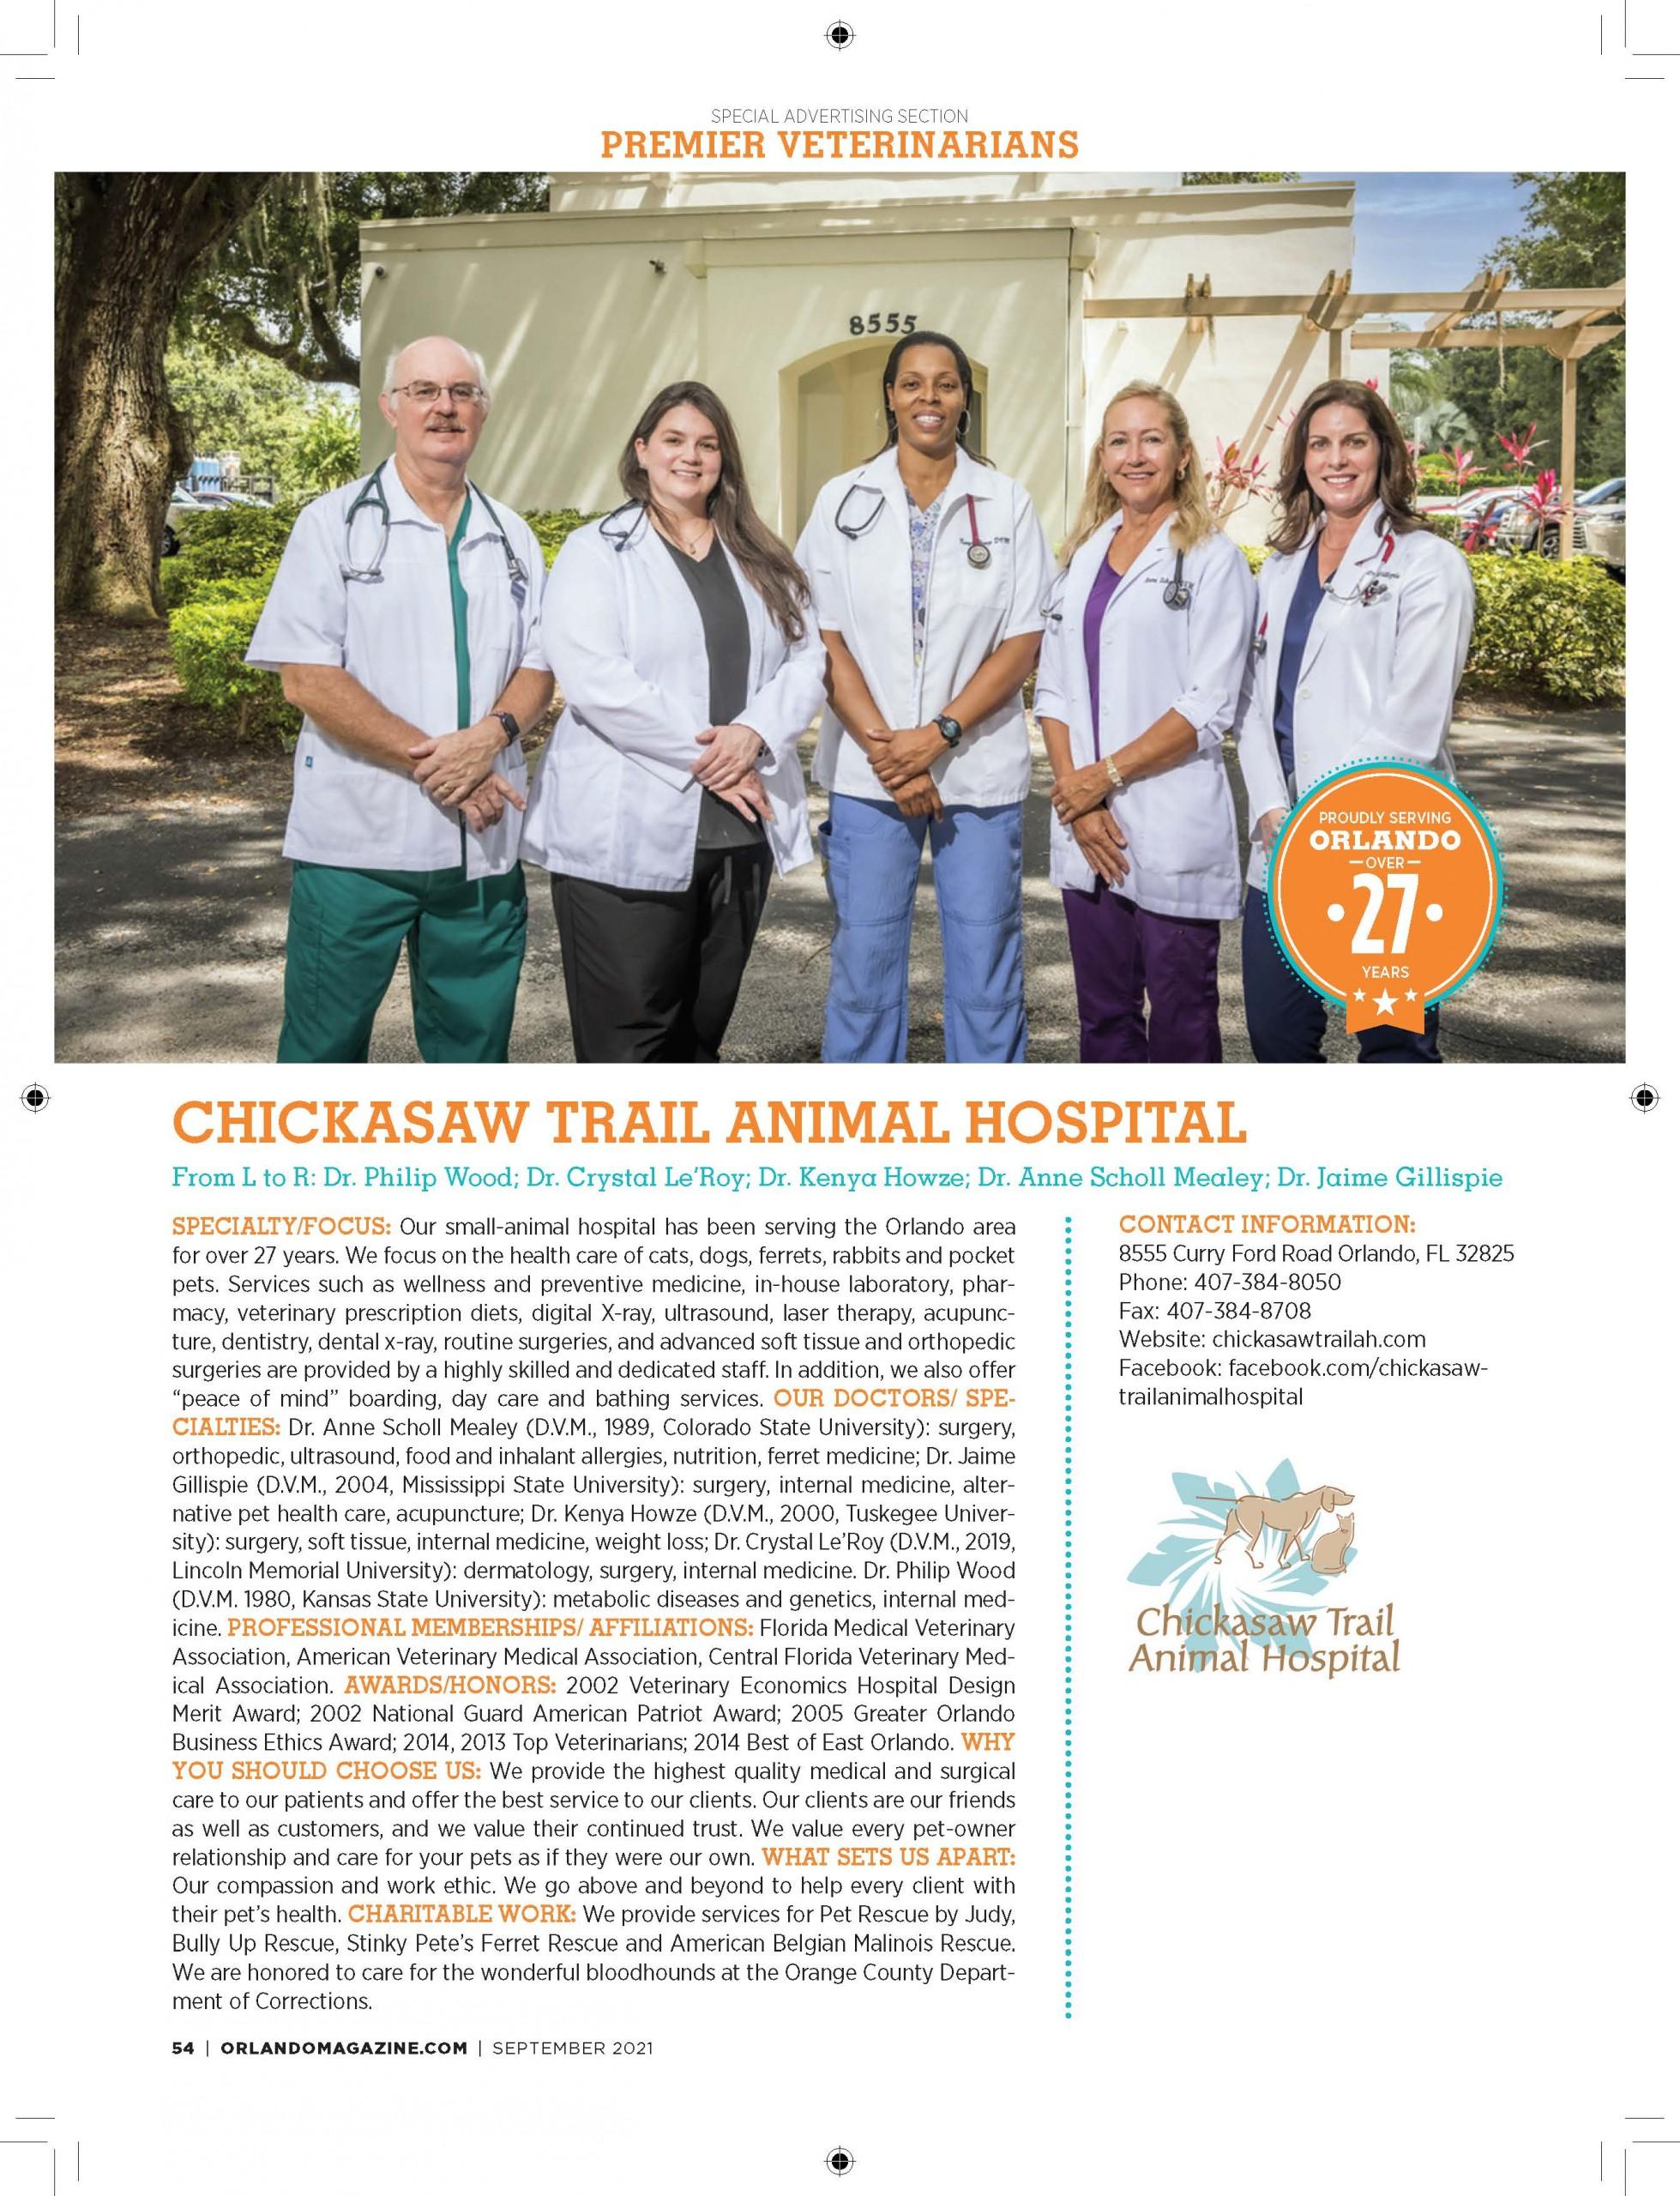 Chickasaw Trail Animal Hospital